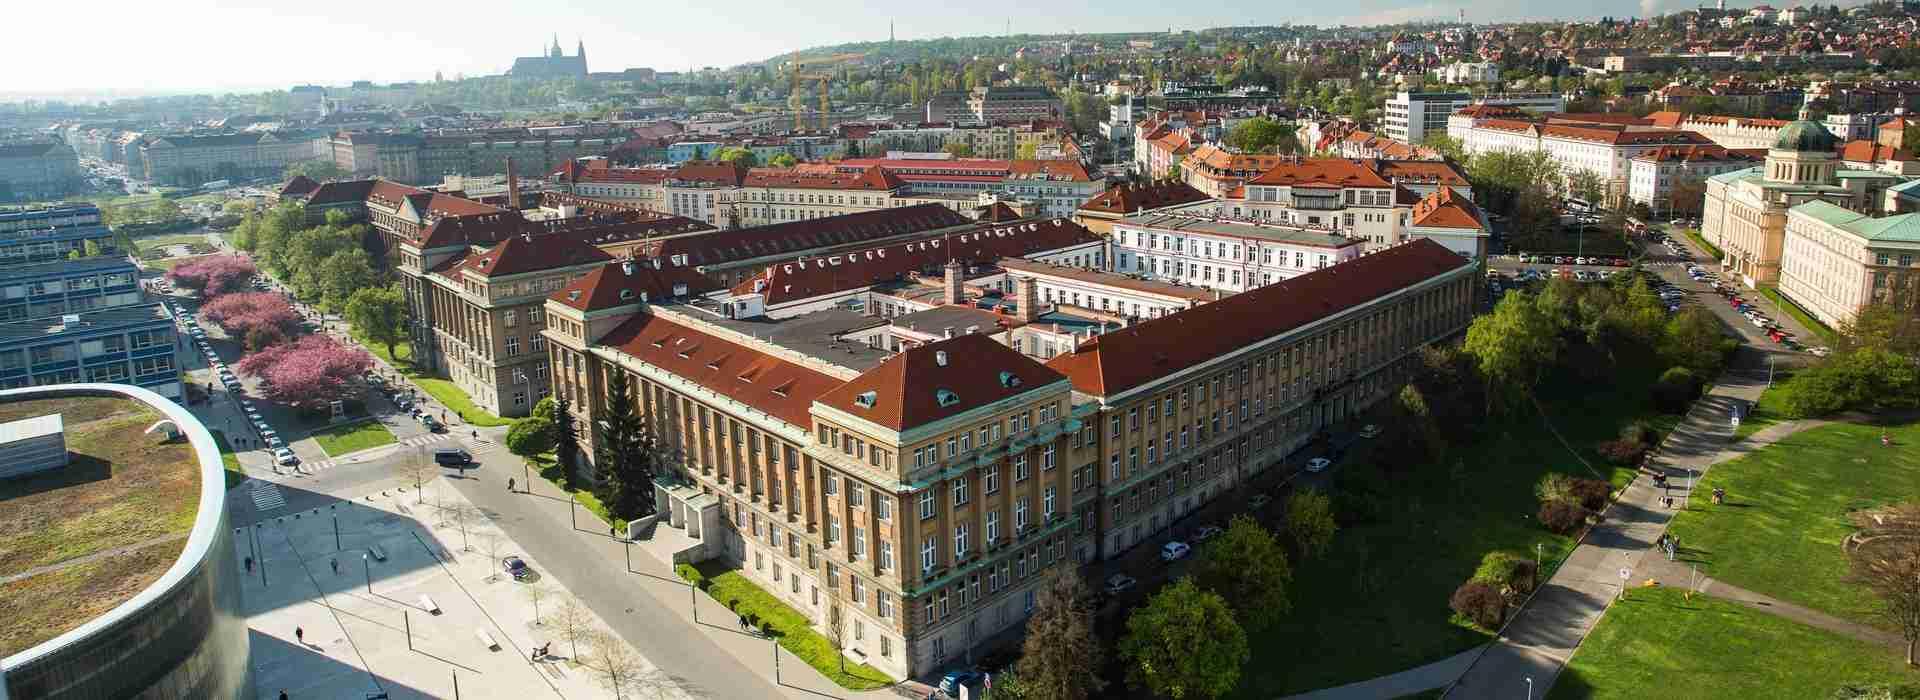 Vysoká škola chemicko-technologická v Praze